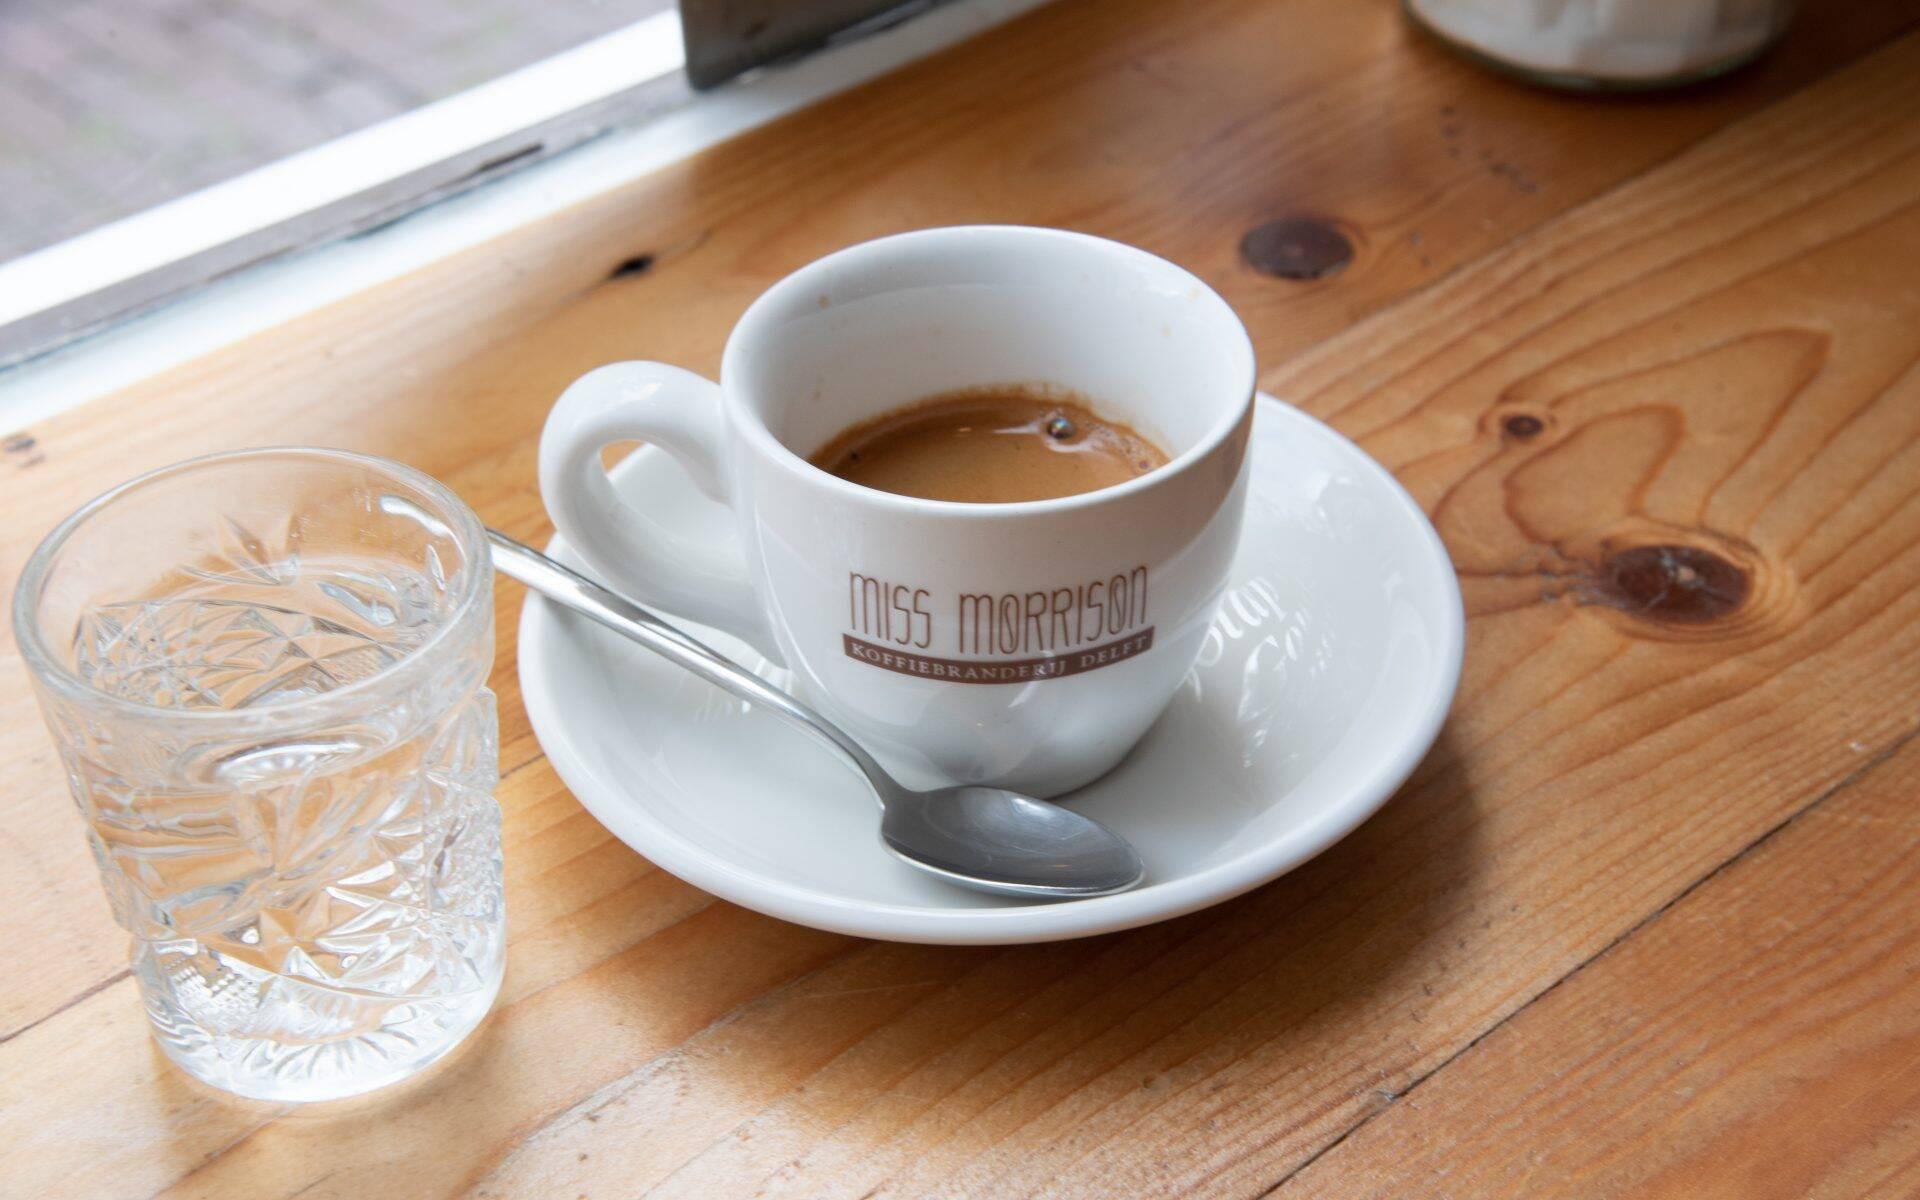 Miss Morrison Koffiebranderij Delft